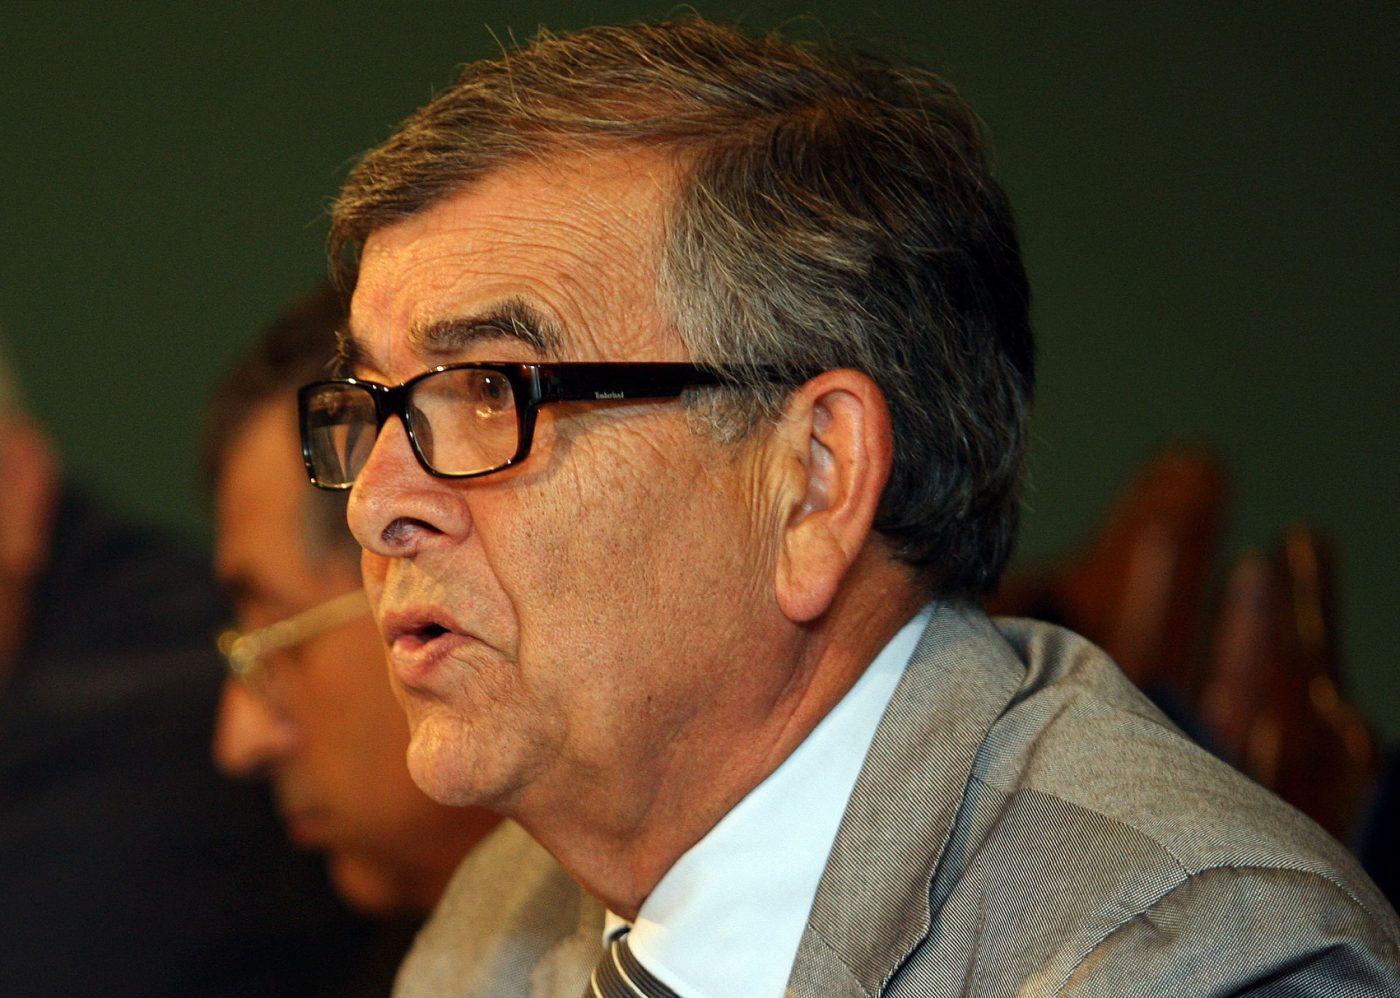 Francisco Fernández de Ana Magán, reelegido presidente de la Asociación Forestal de Galicia